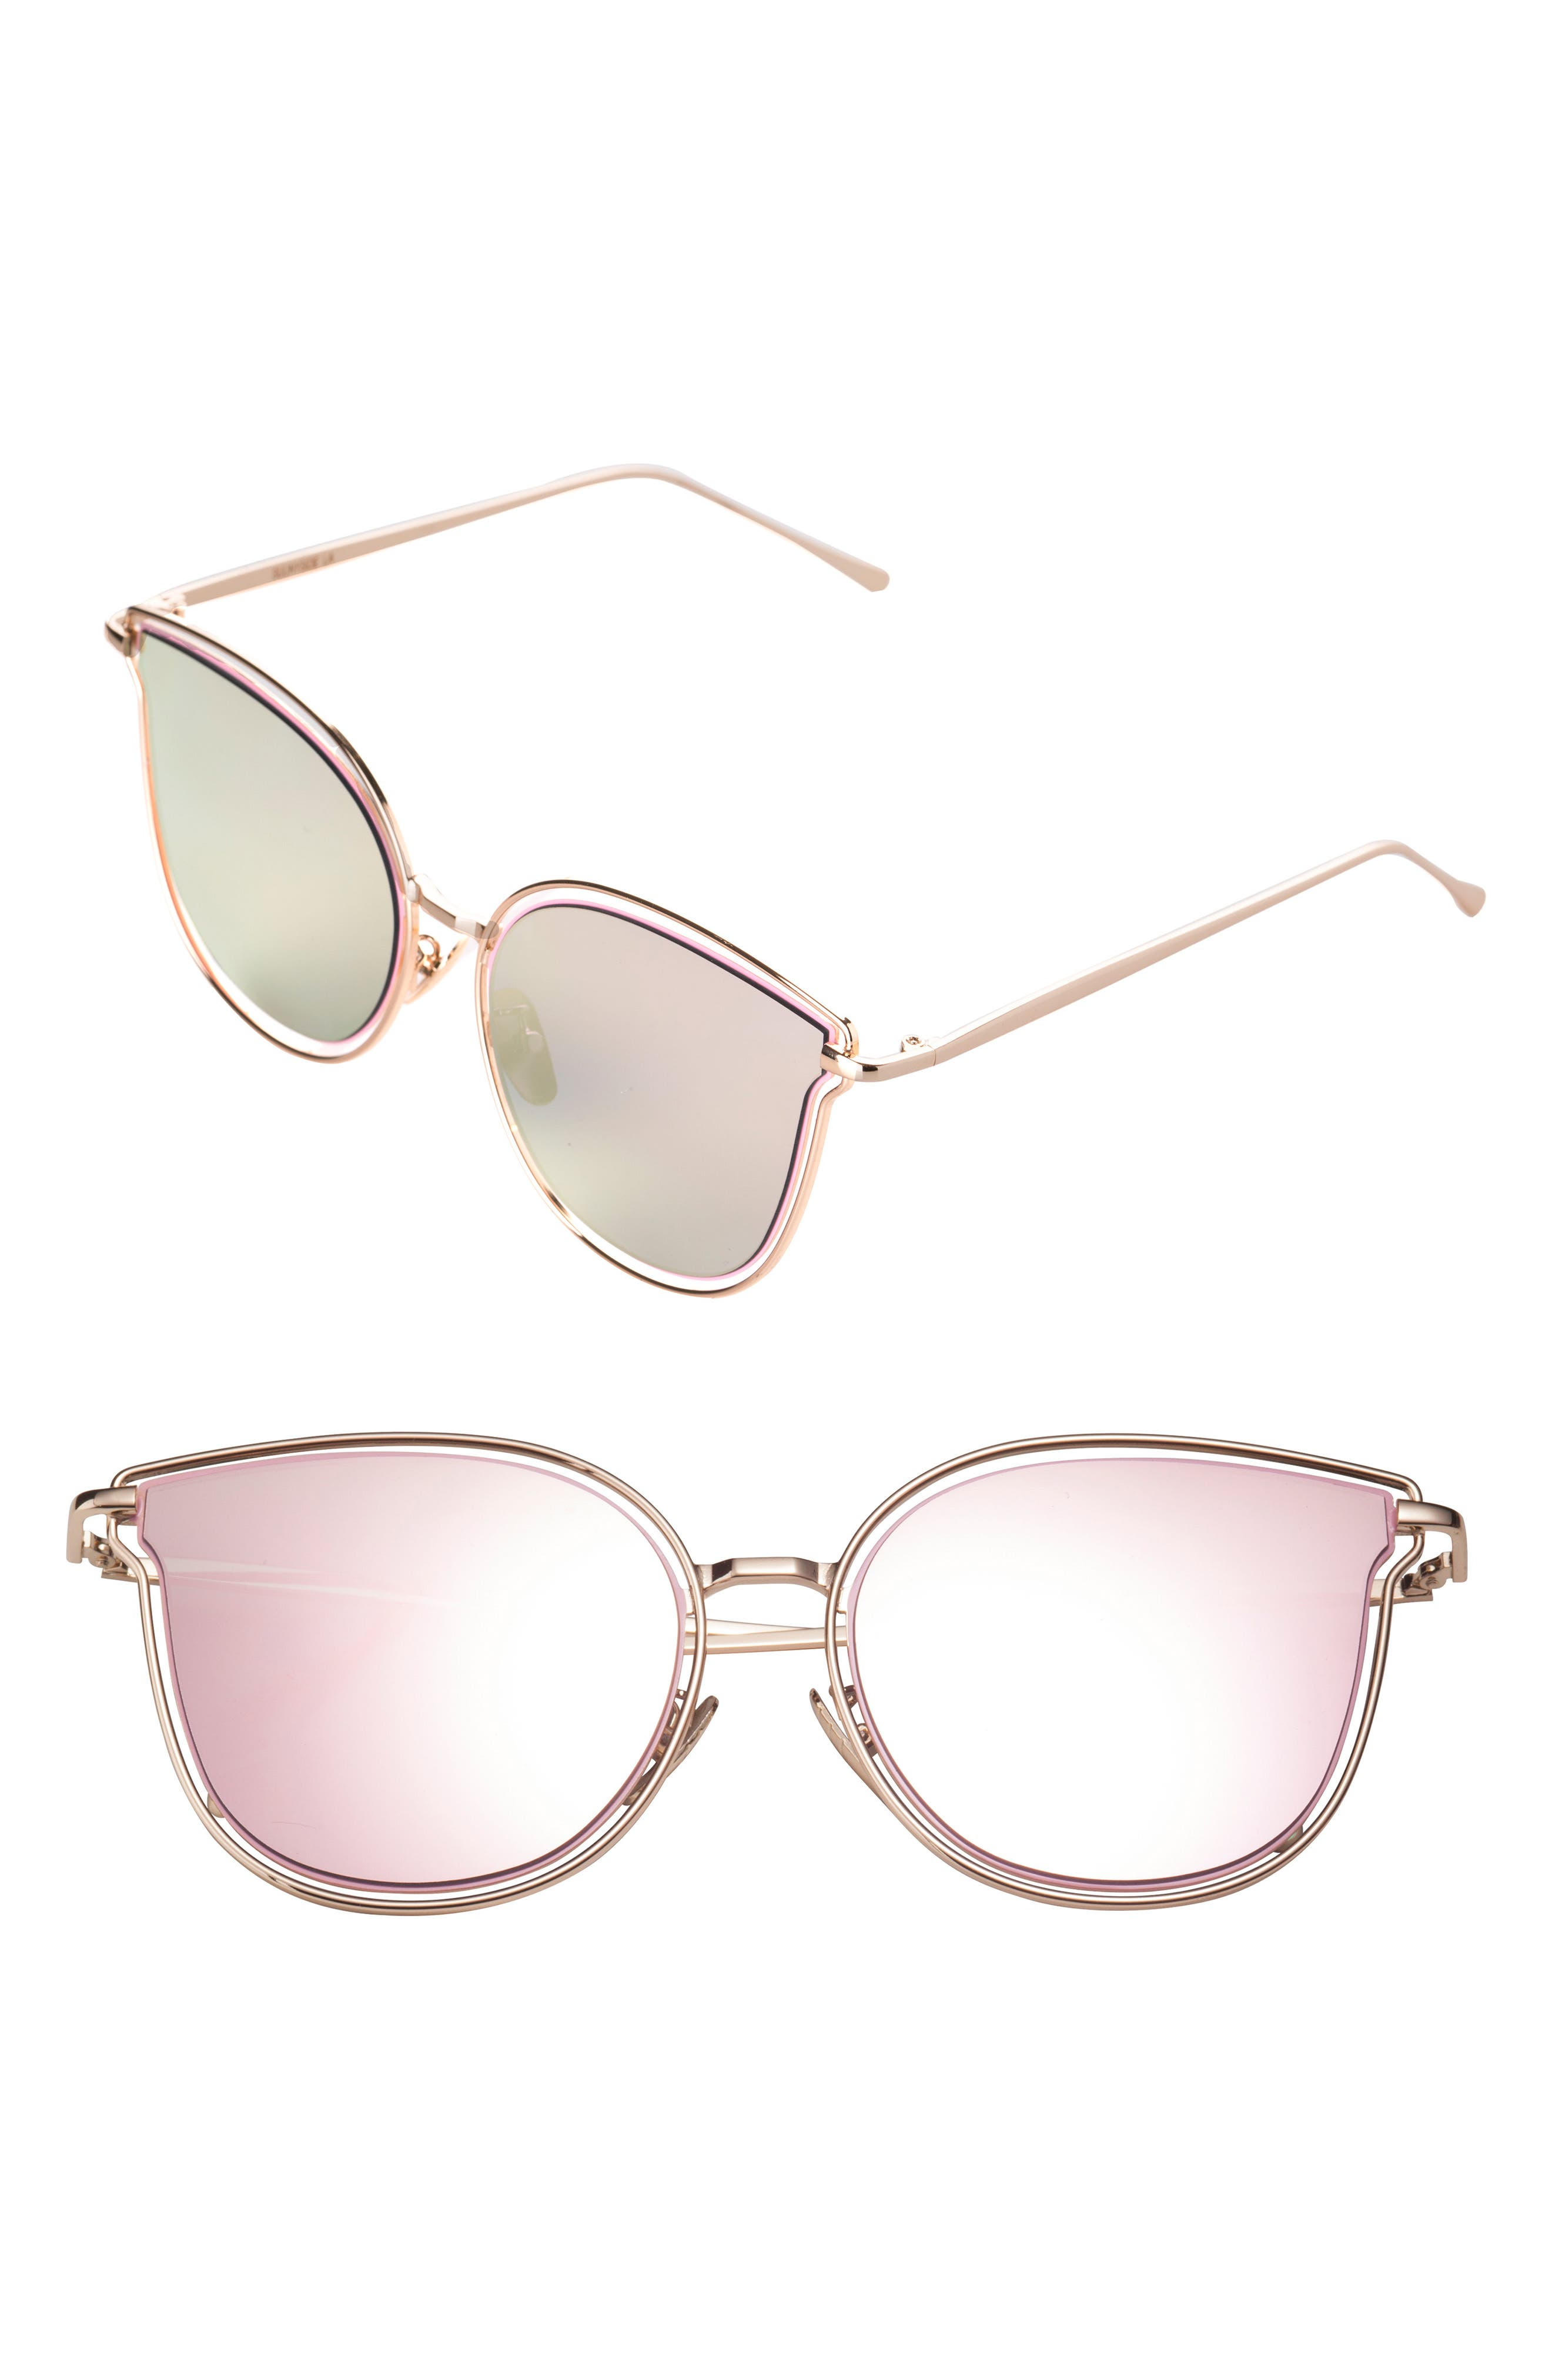 Main Image - SunnySide LA 54mm Mirrored Cat Eye Sunglasses